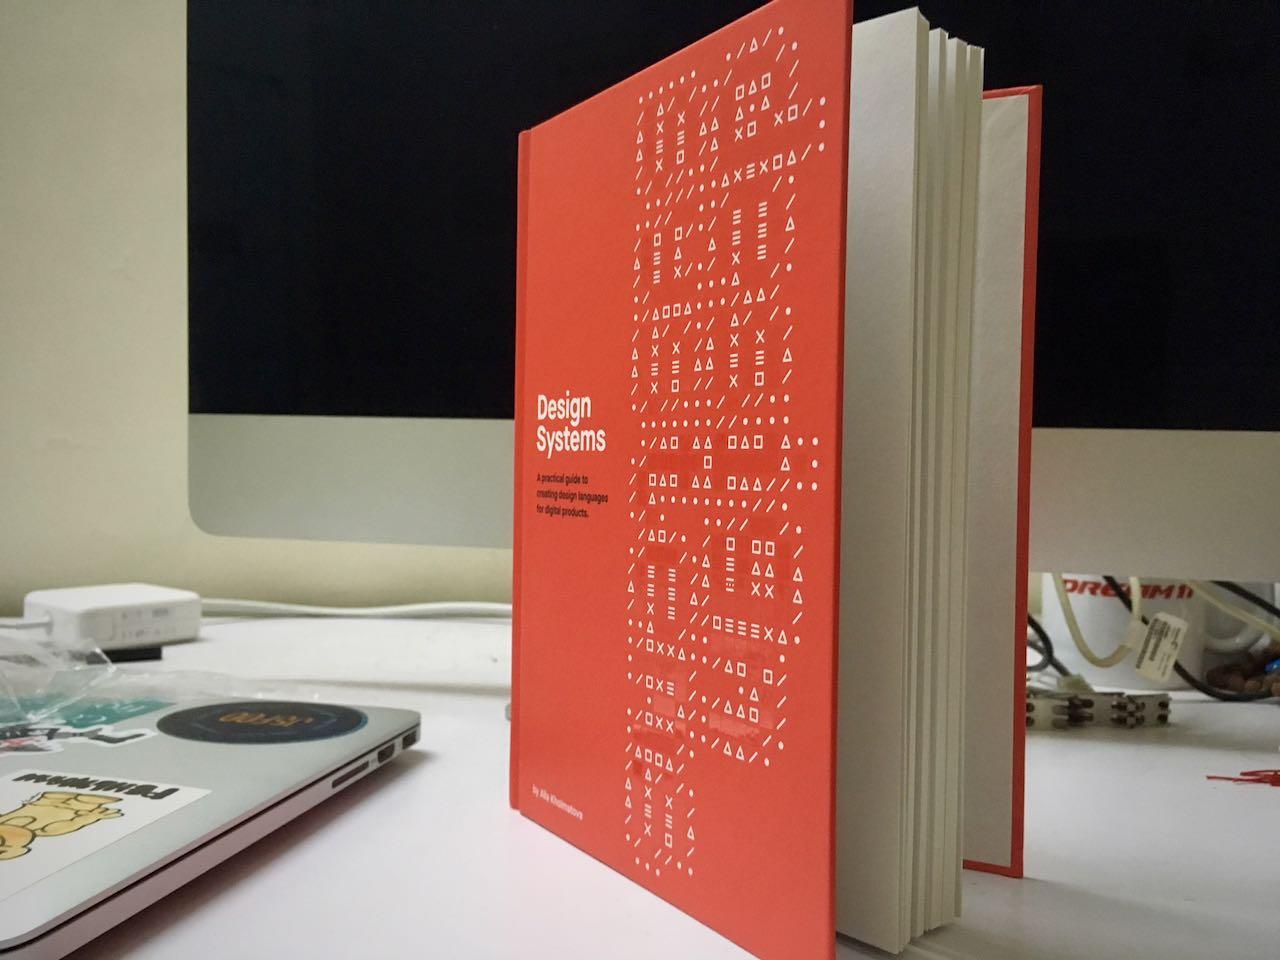 design-systems-smashing-book-developer-html5-css3